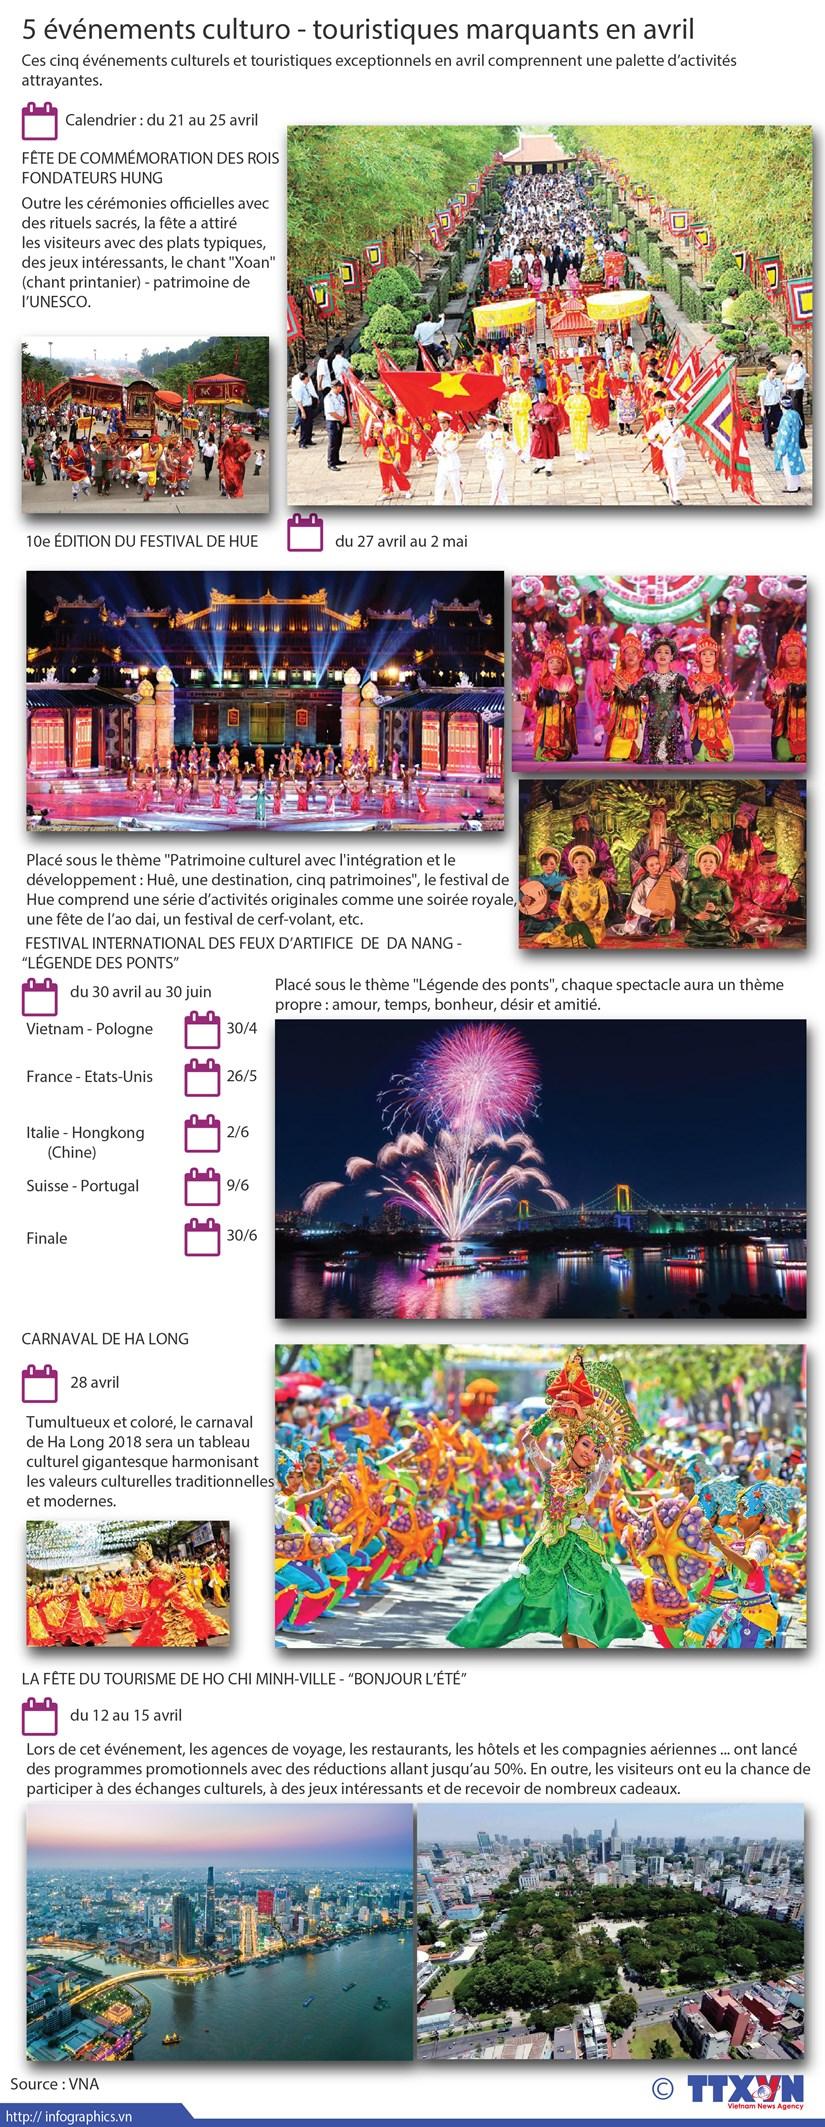 5 evenements culturo - touristiques marquants en avril hinh anh 1